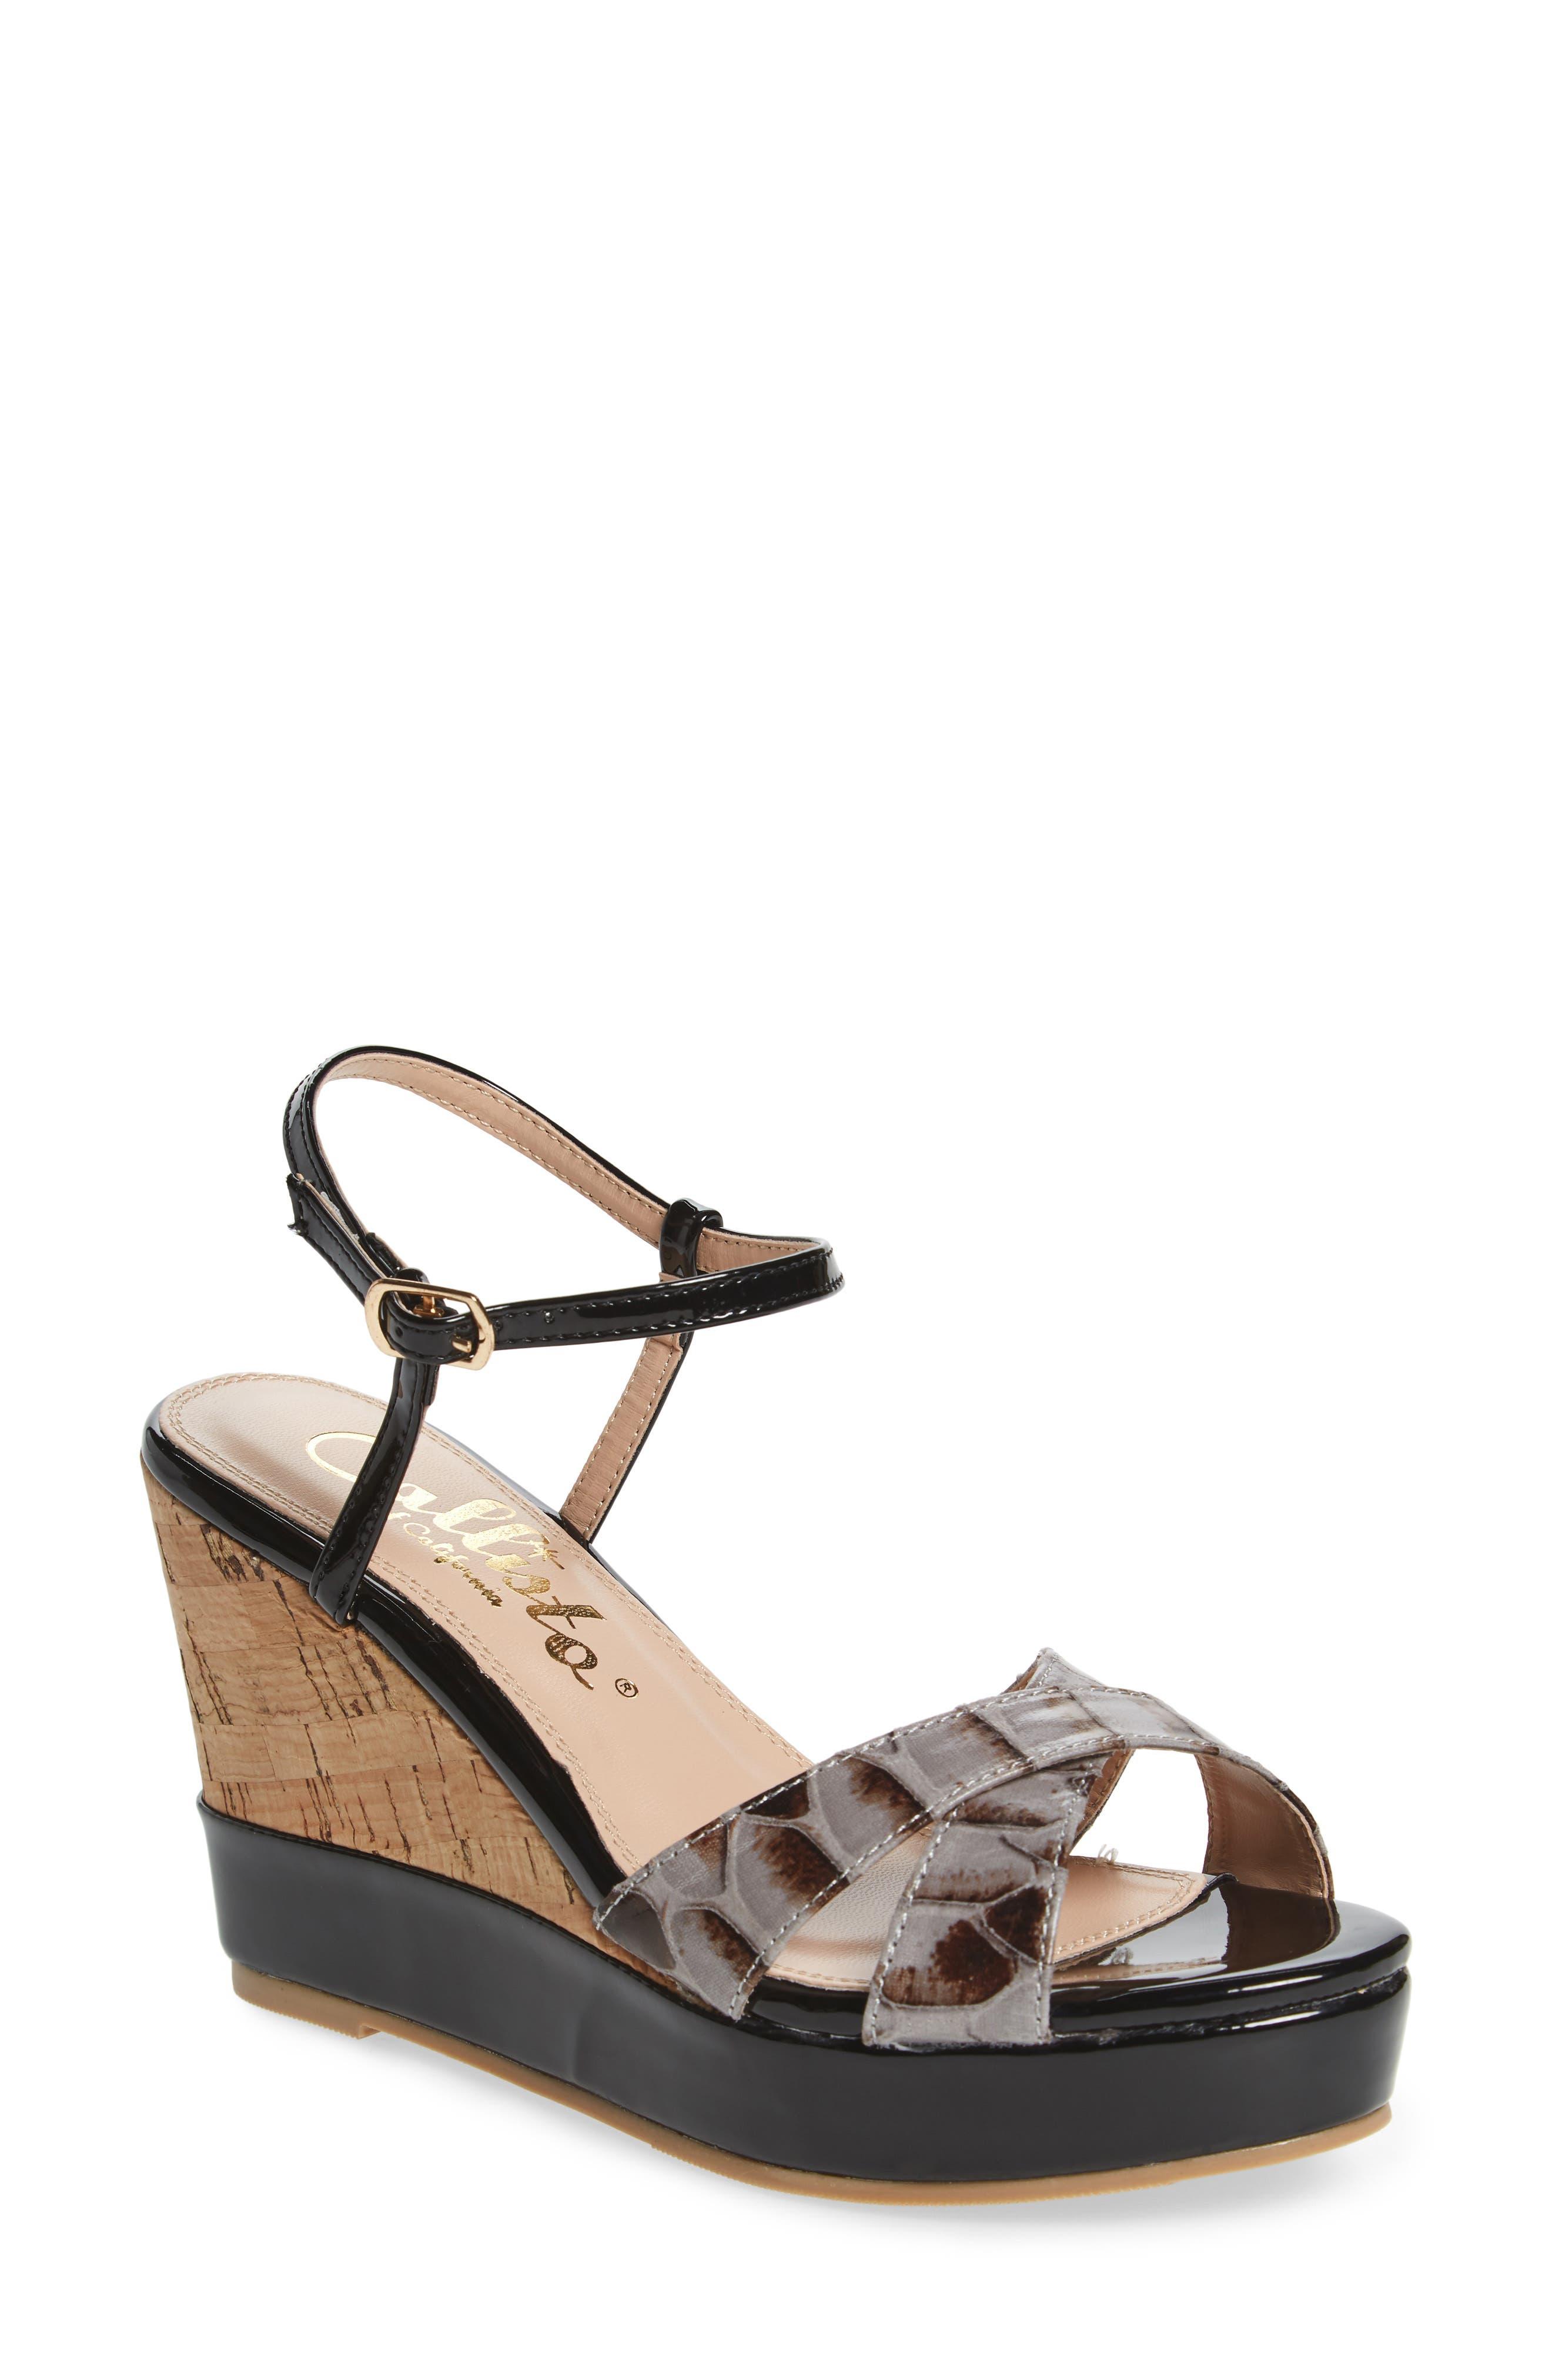 Lottie Platform Wedge Sandal,                         Main,                         color, BLACK SYNTHETIC